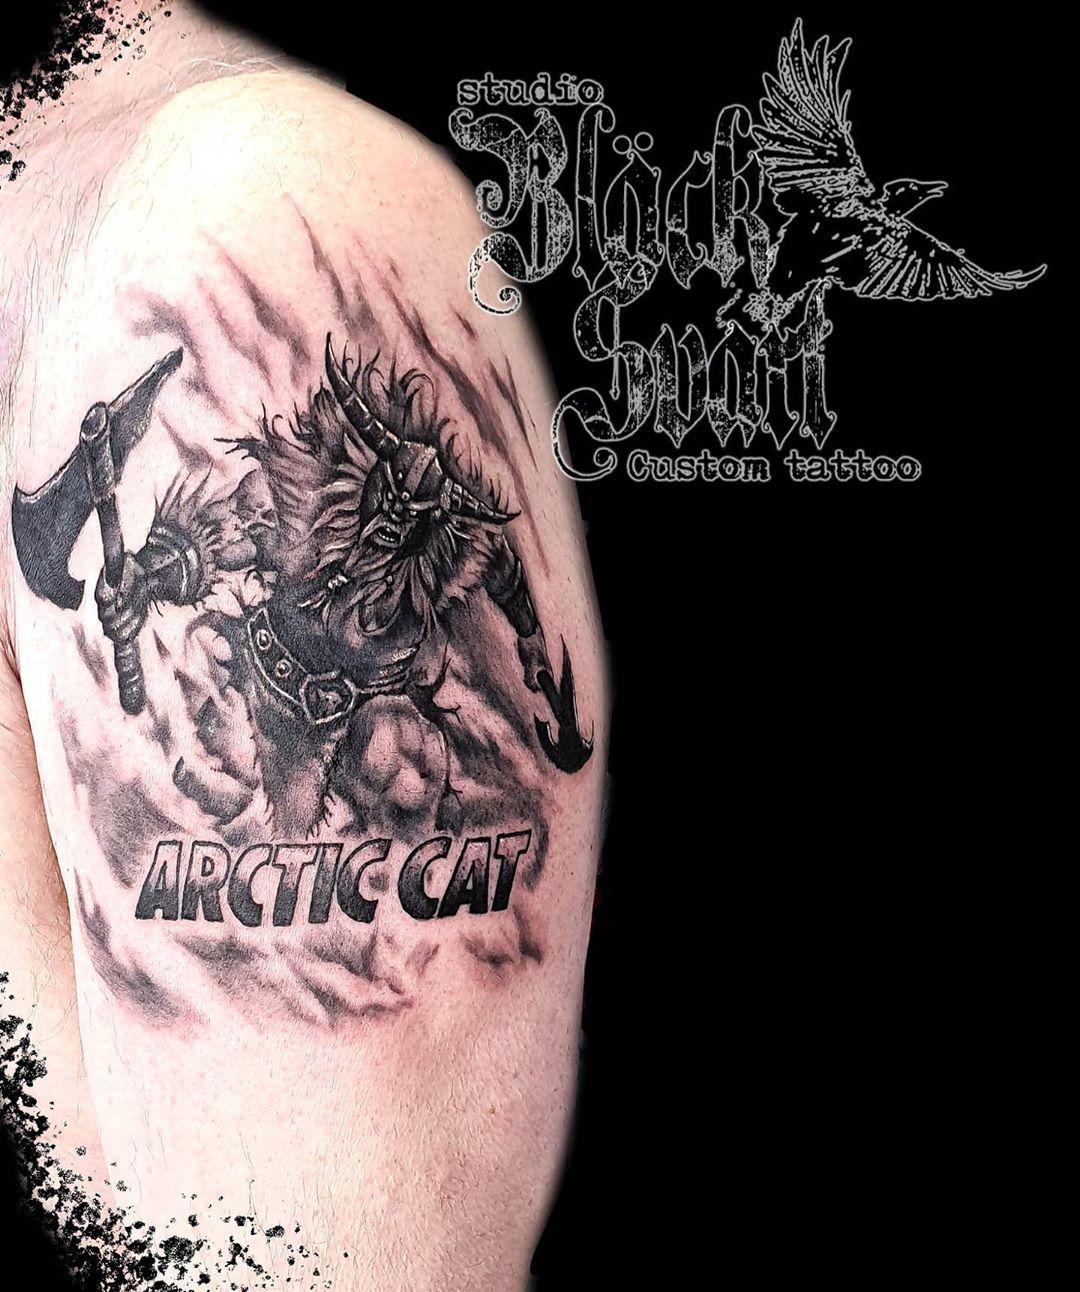 Arctic Viking. 🌊⛵🐯❄ #vikingtattoo #arcticcat #fury #axes #artist #snowmobile #destiny #blackworktattoo  #northmen #northwest #norrland #lappland #vilhelmina #studiobläcksvart #tattooink #tattoo #tatueringsstudio #tatuering #ink #armtattoo #artist #artwork #västerbotten #landofgods #blackthirteen #blackandgrey #blackandgreytattoo #greyscale #realistictattoo #vojmå @silverbackink @hustlebutterdeluxe @stencilstuff @cheyenne_tattooequipment @davincineedles @the.best.b.n.g.tattoo.page @blackandgrey